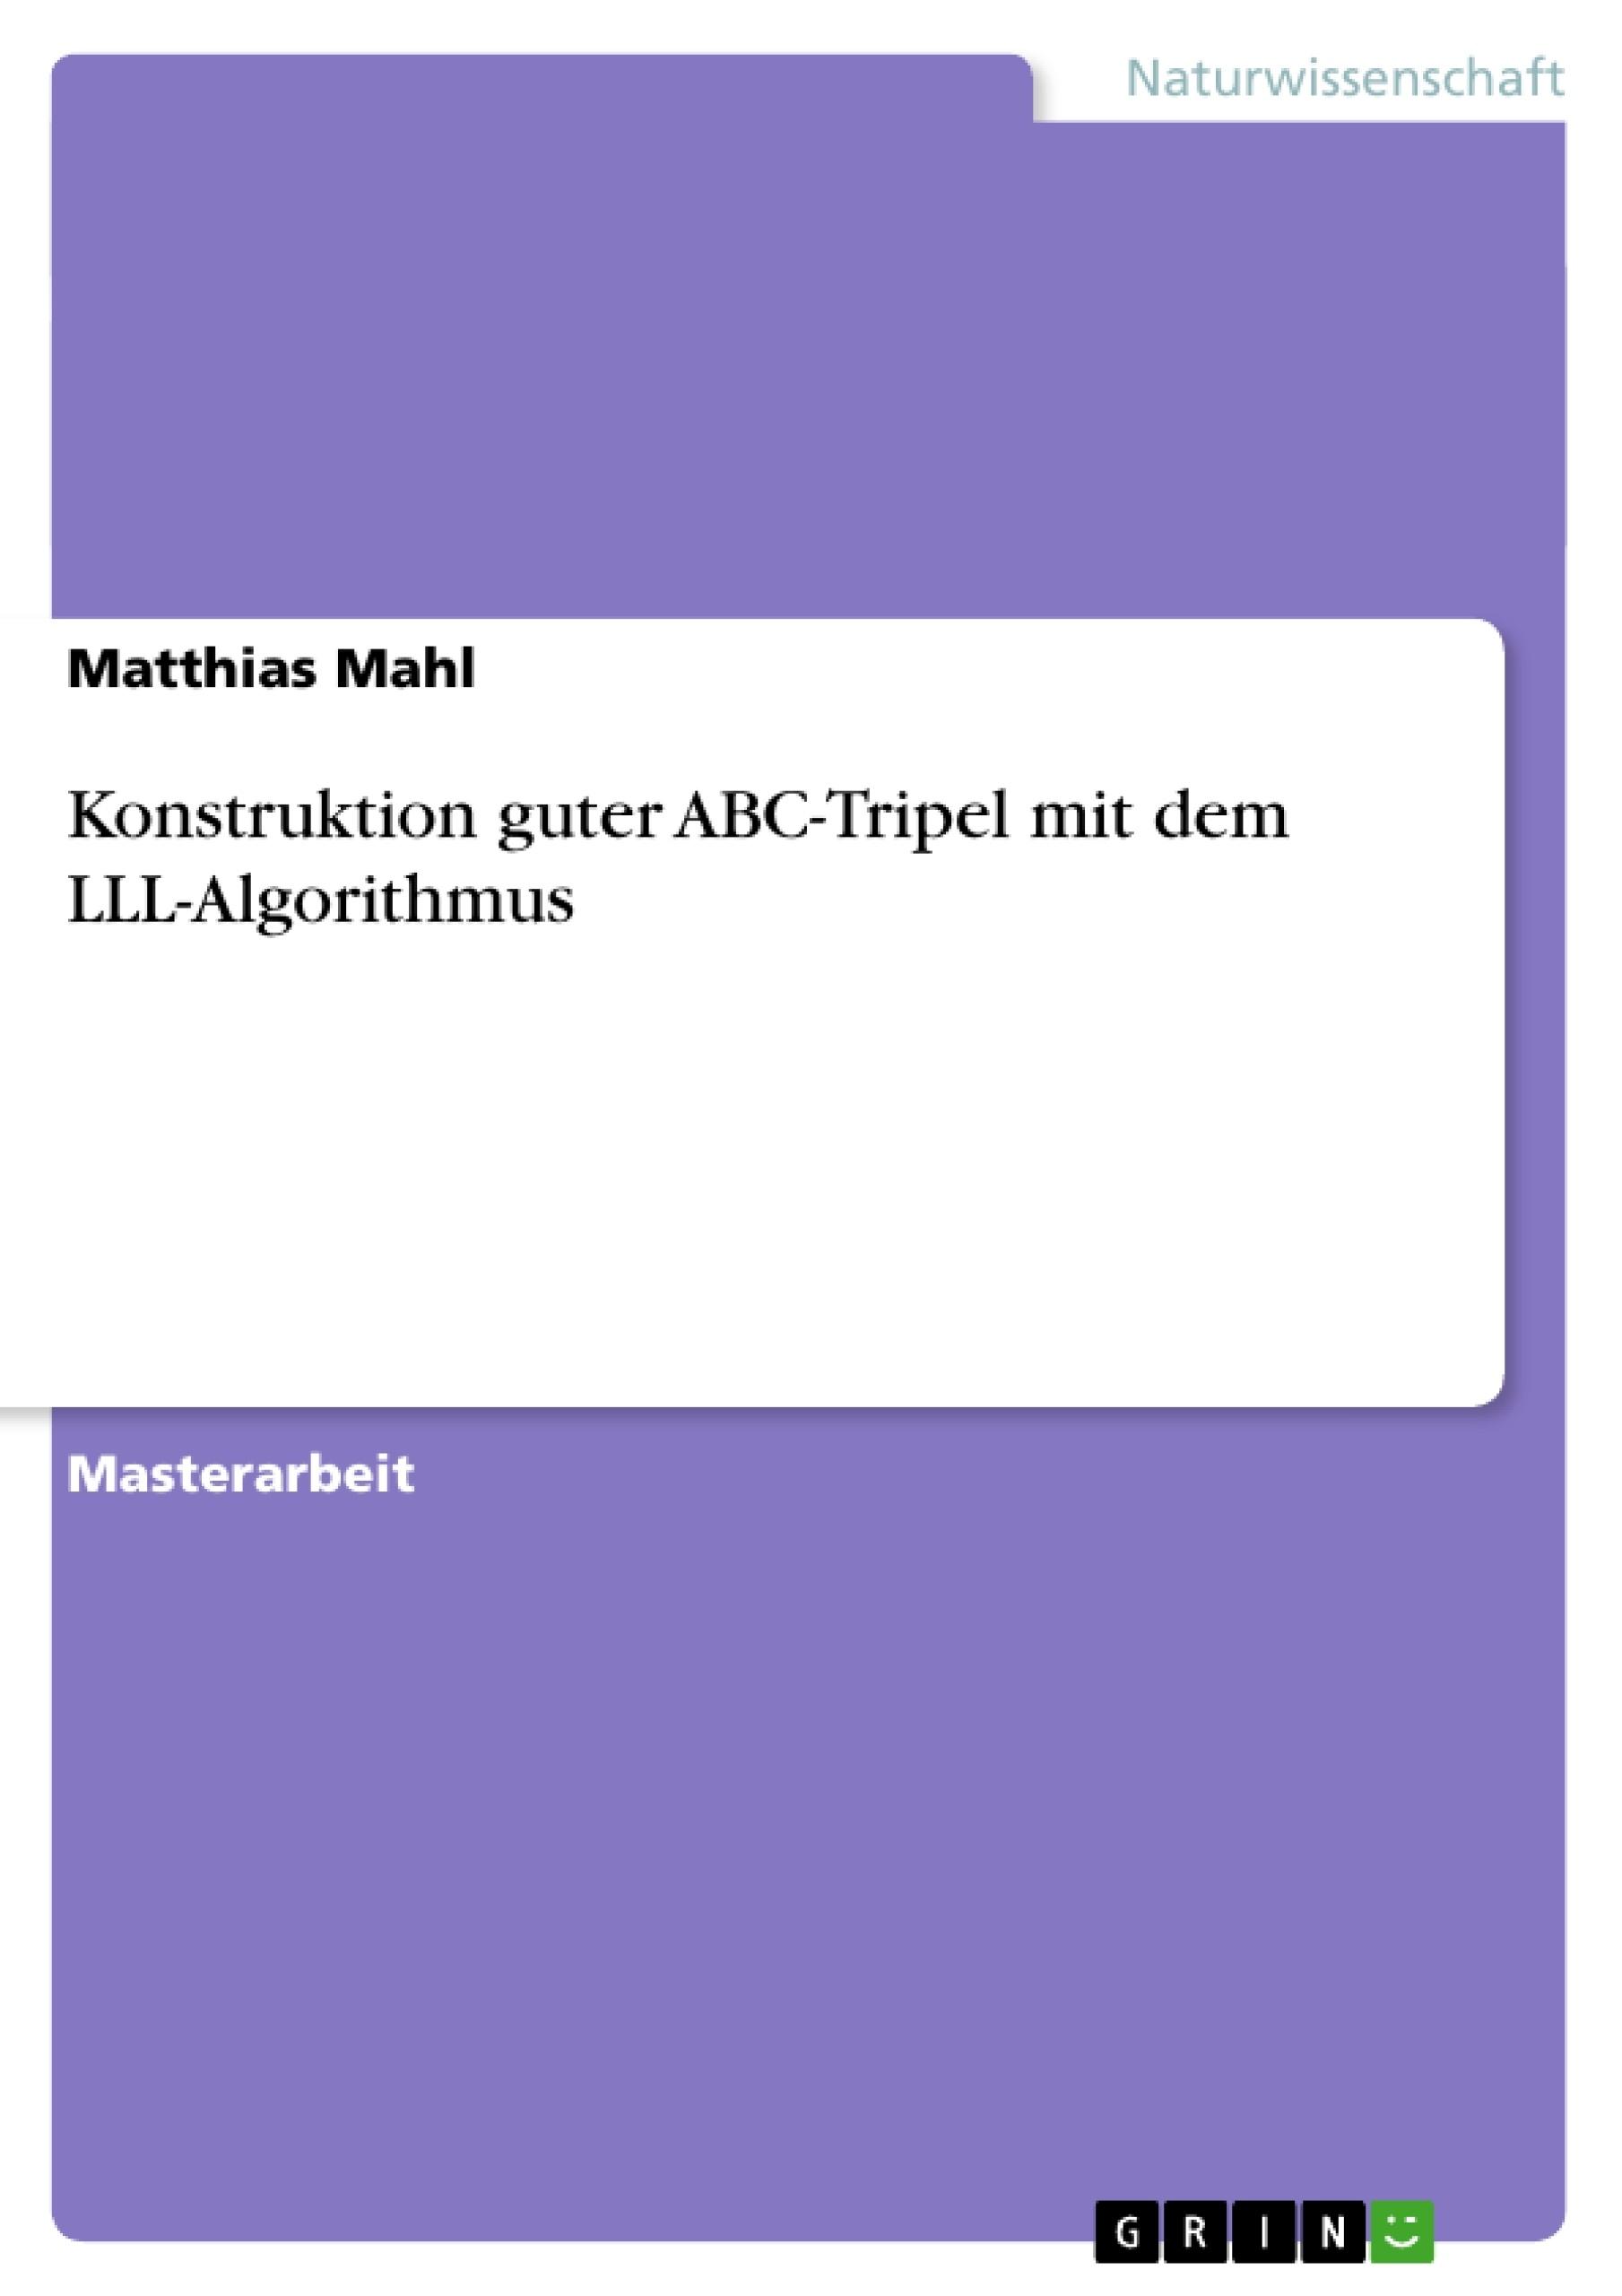 Titel: Konstruktion guter ABC-Tripel mit dem LLL-Algorithmus